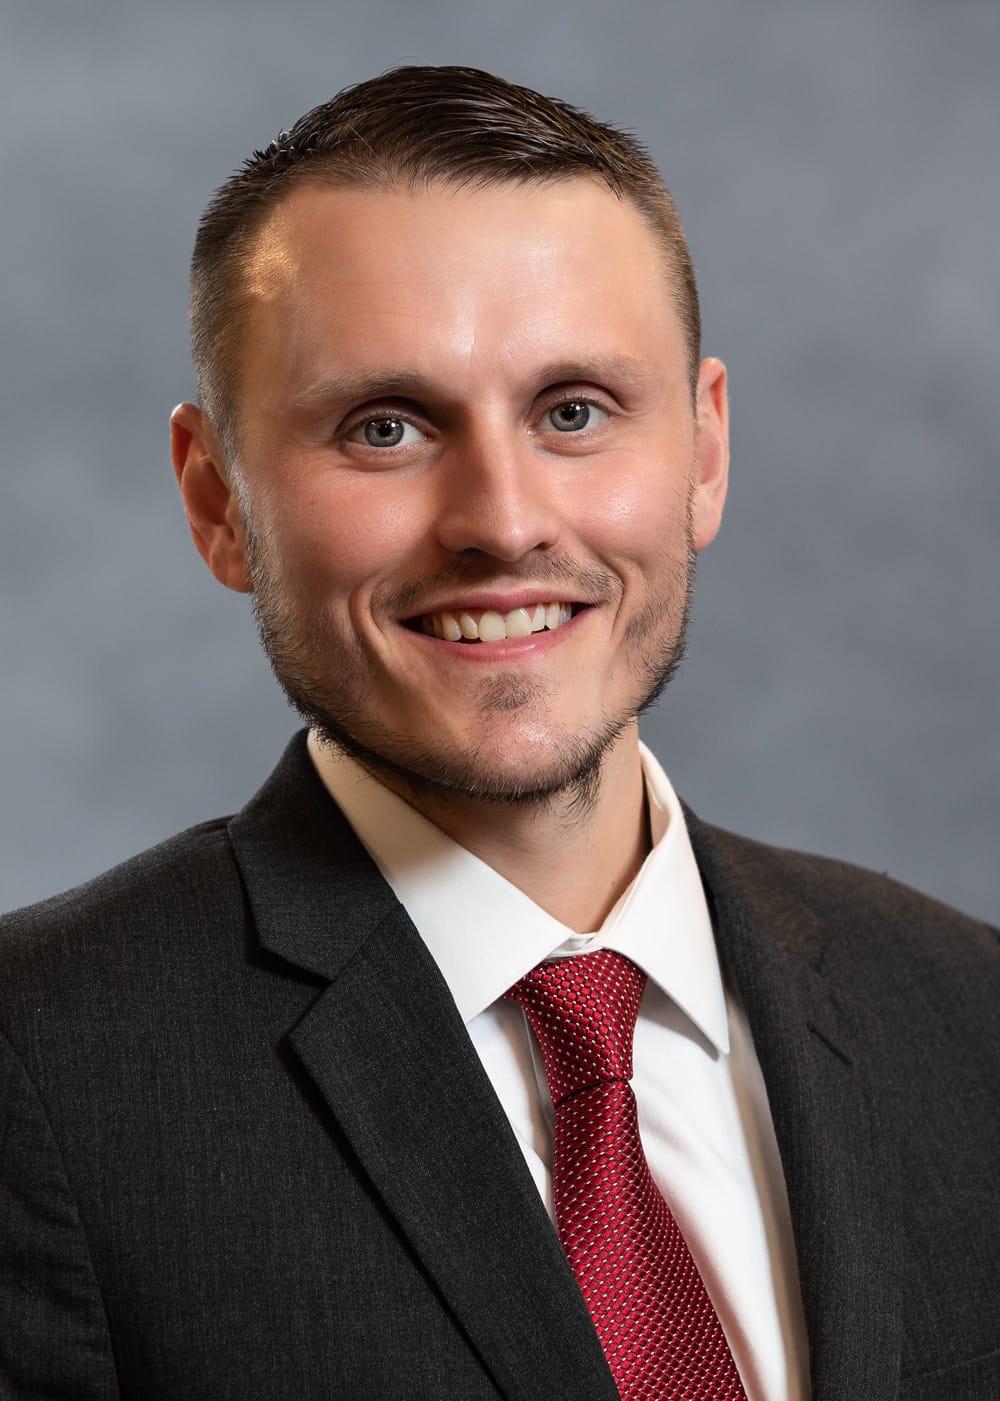 Photo of Jacob Ward, VP of Marketing at R.I.A. FCU